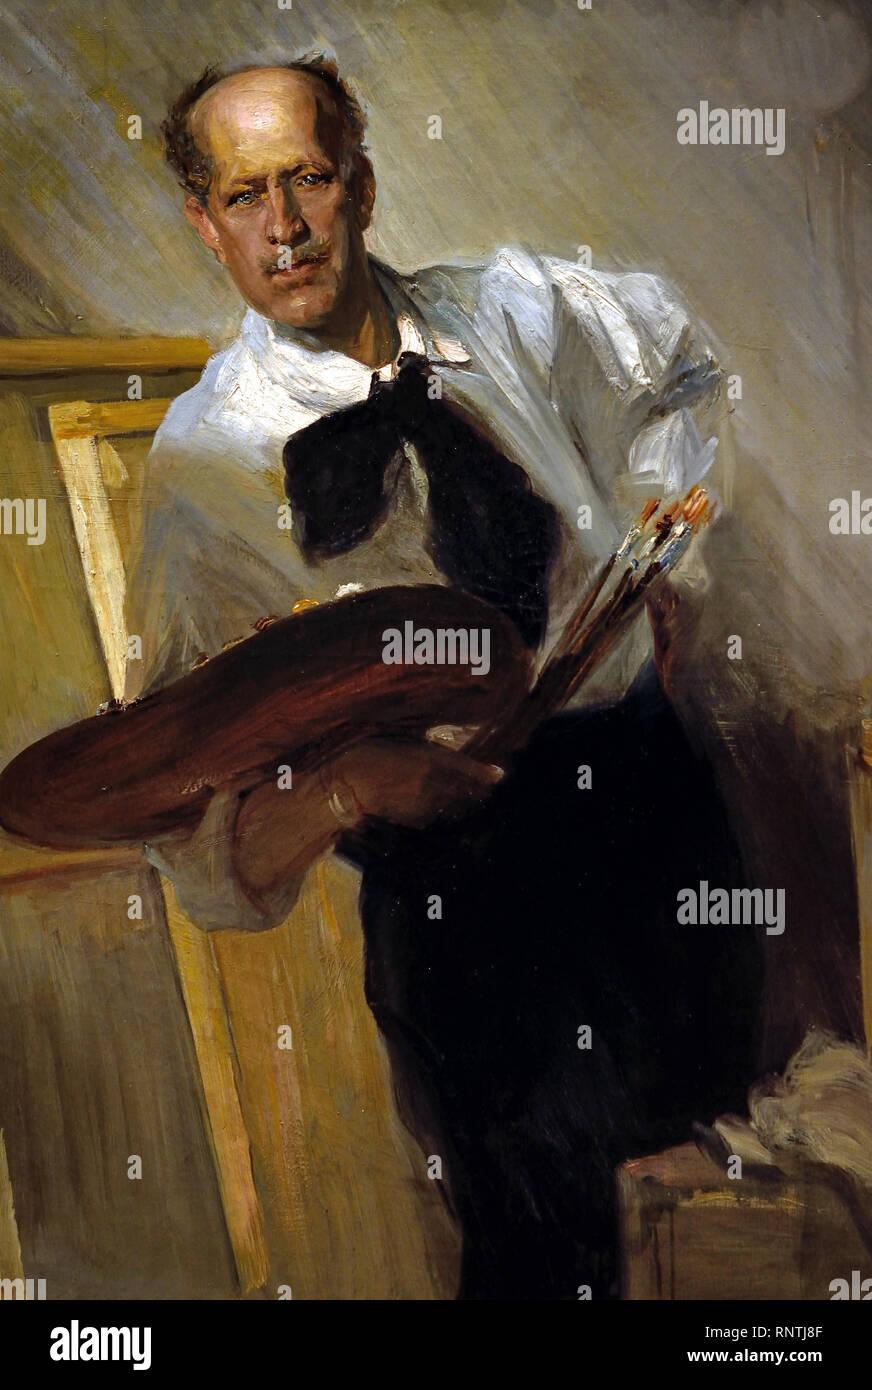 Self Portrait 1905 by Jose Villegas Cordero 1844-1921 Spain, Spanish, - Stock Image